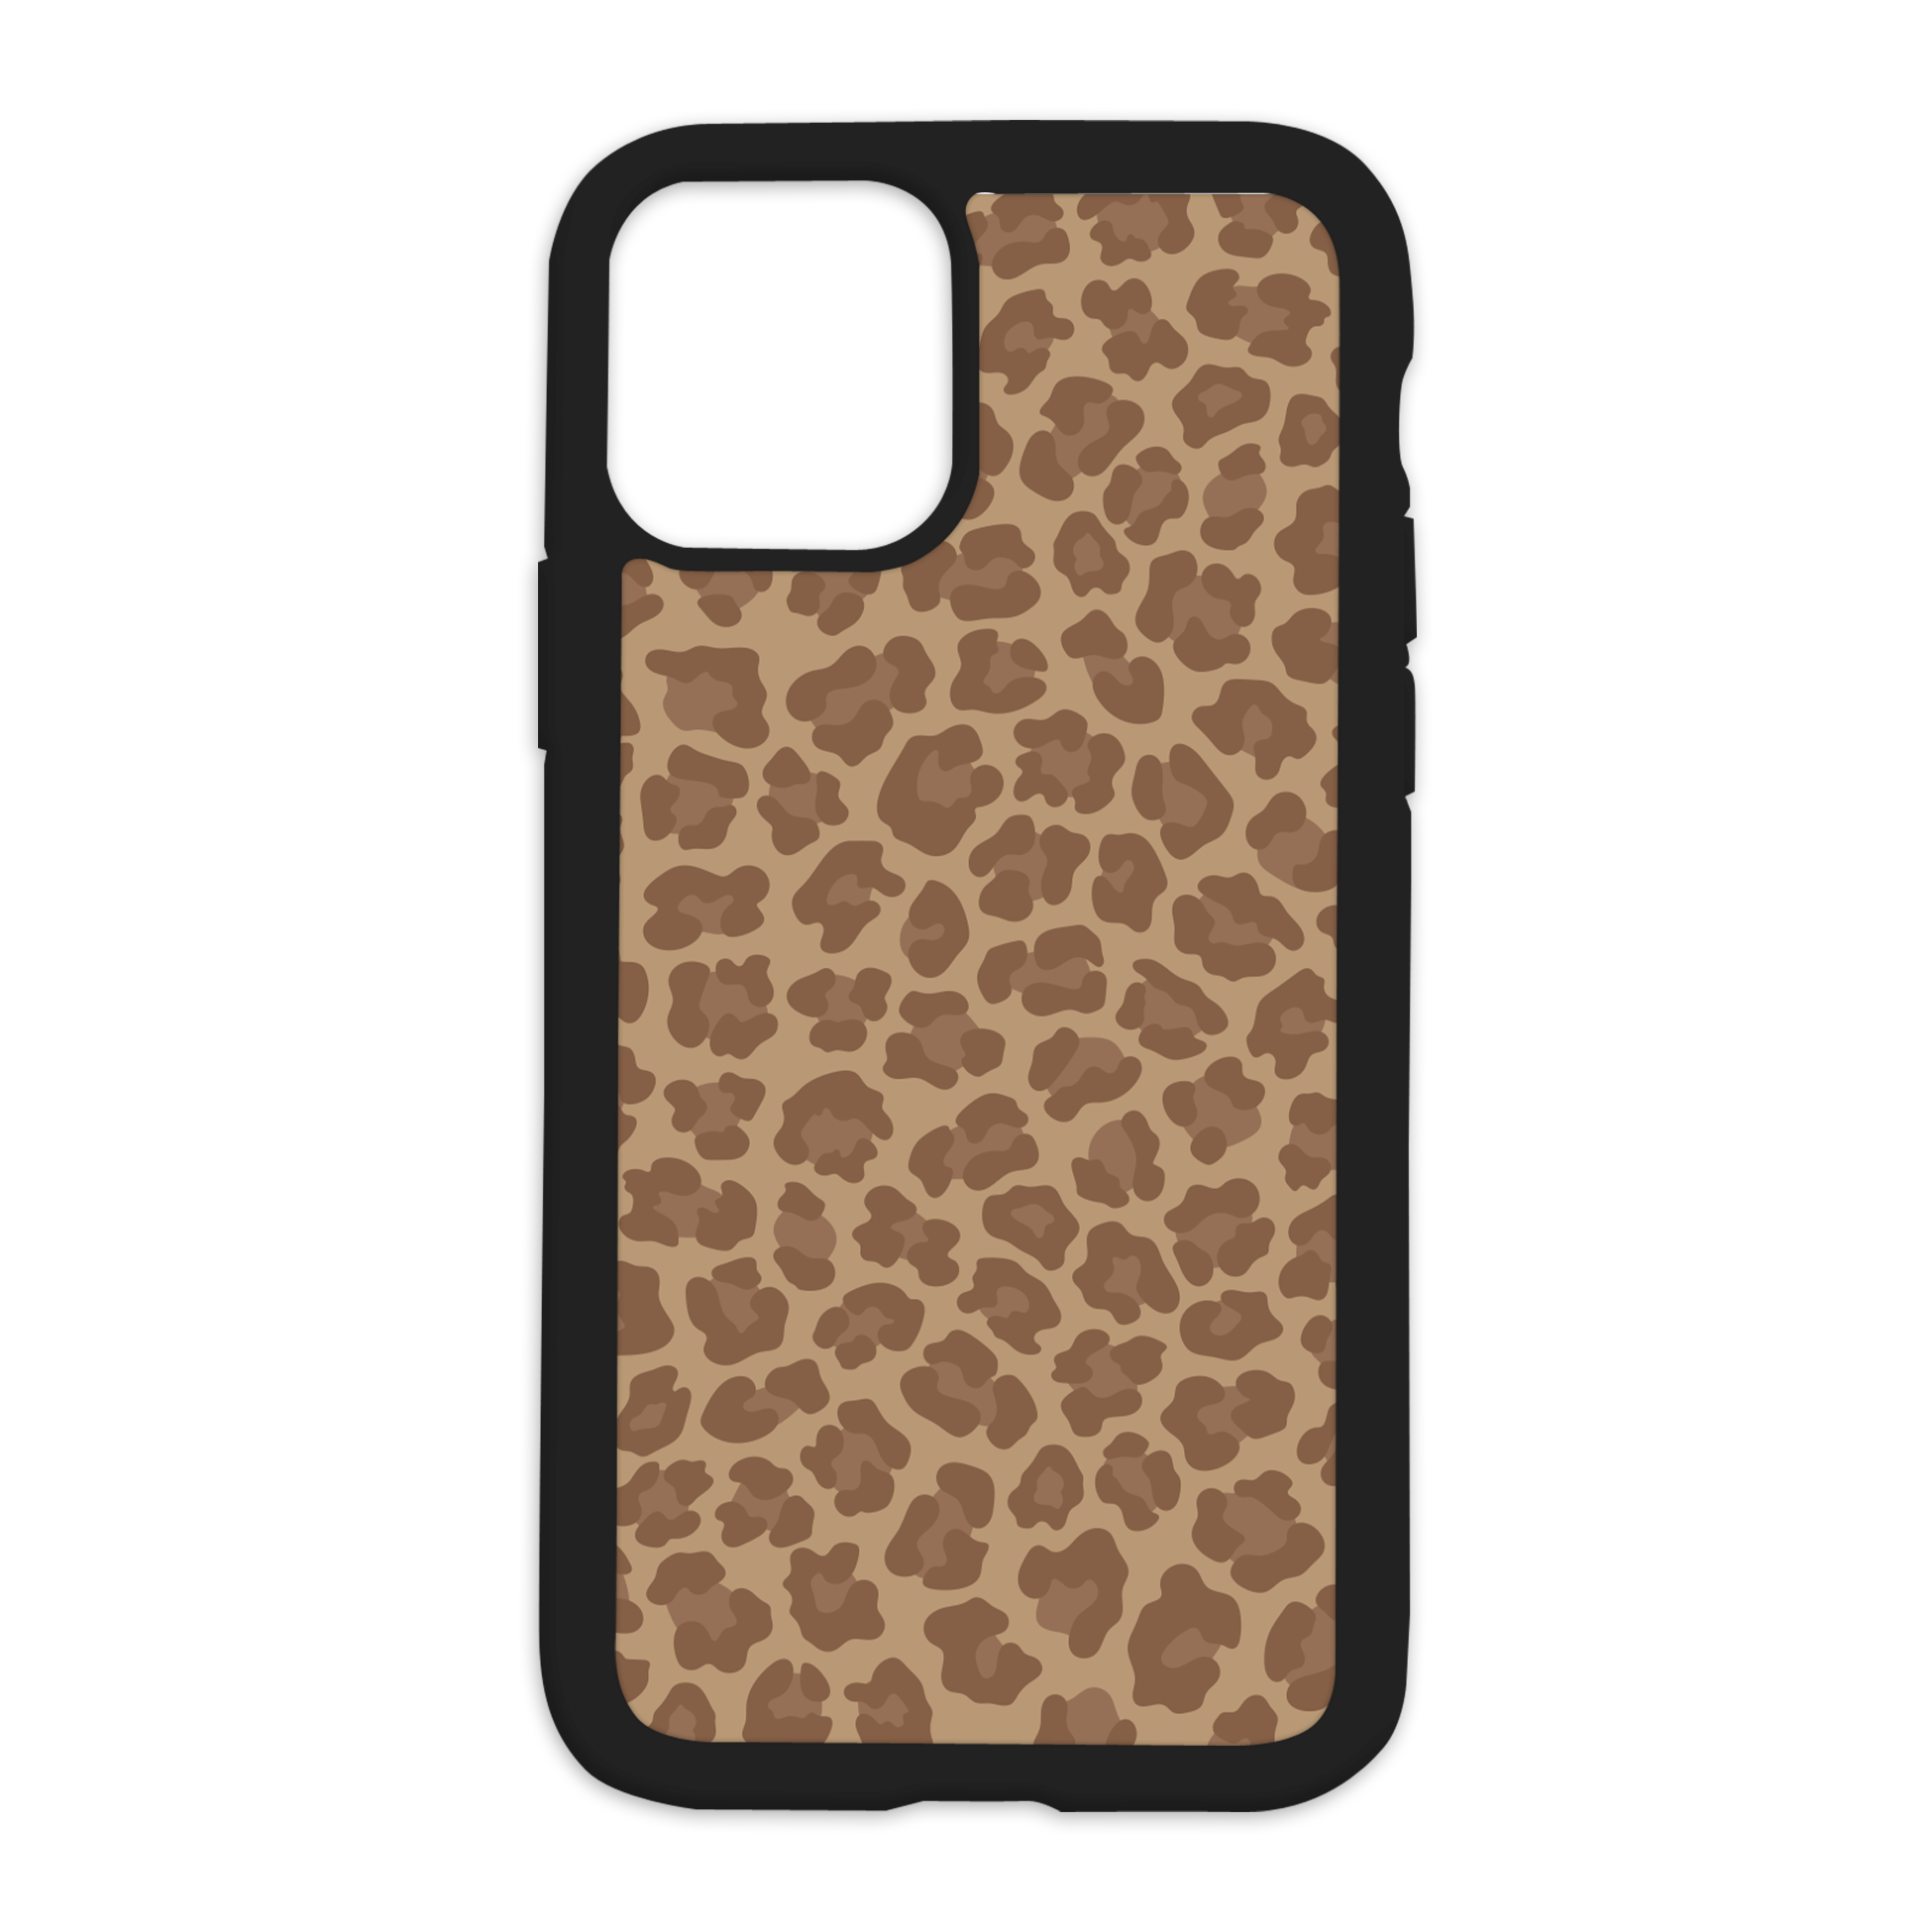 Leopard Print Design On Black Phone Case - 6/6s+ / Brown